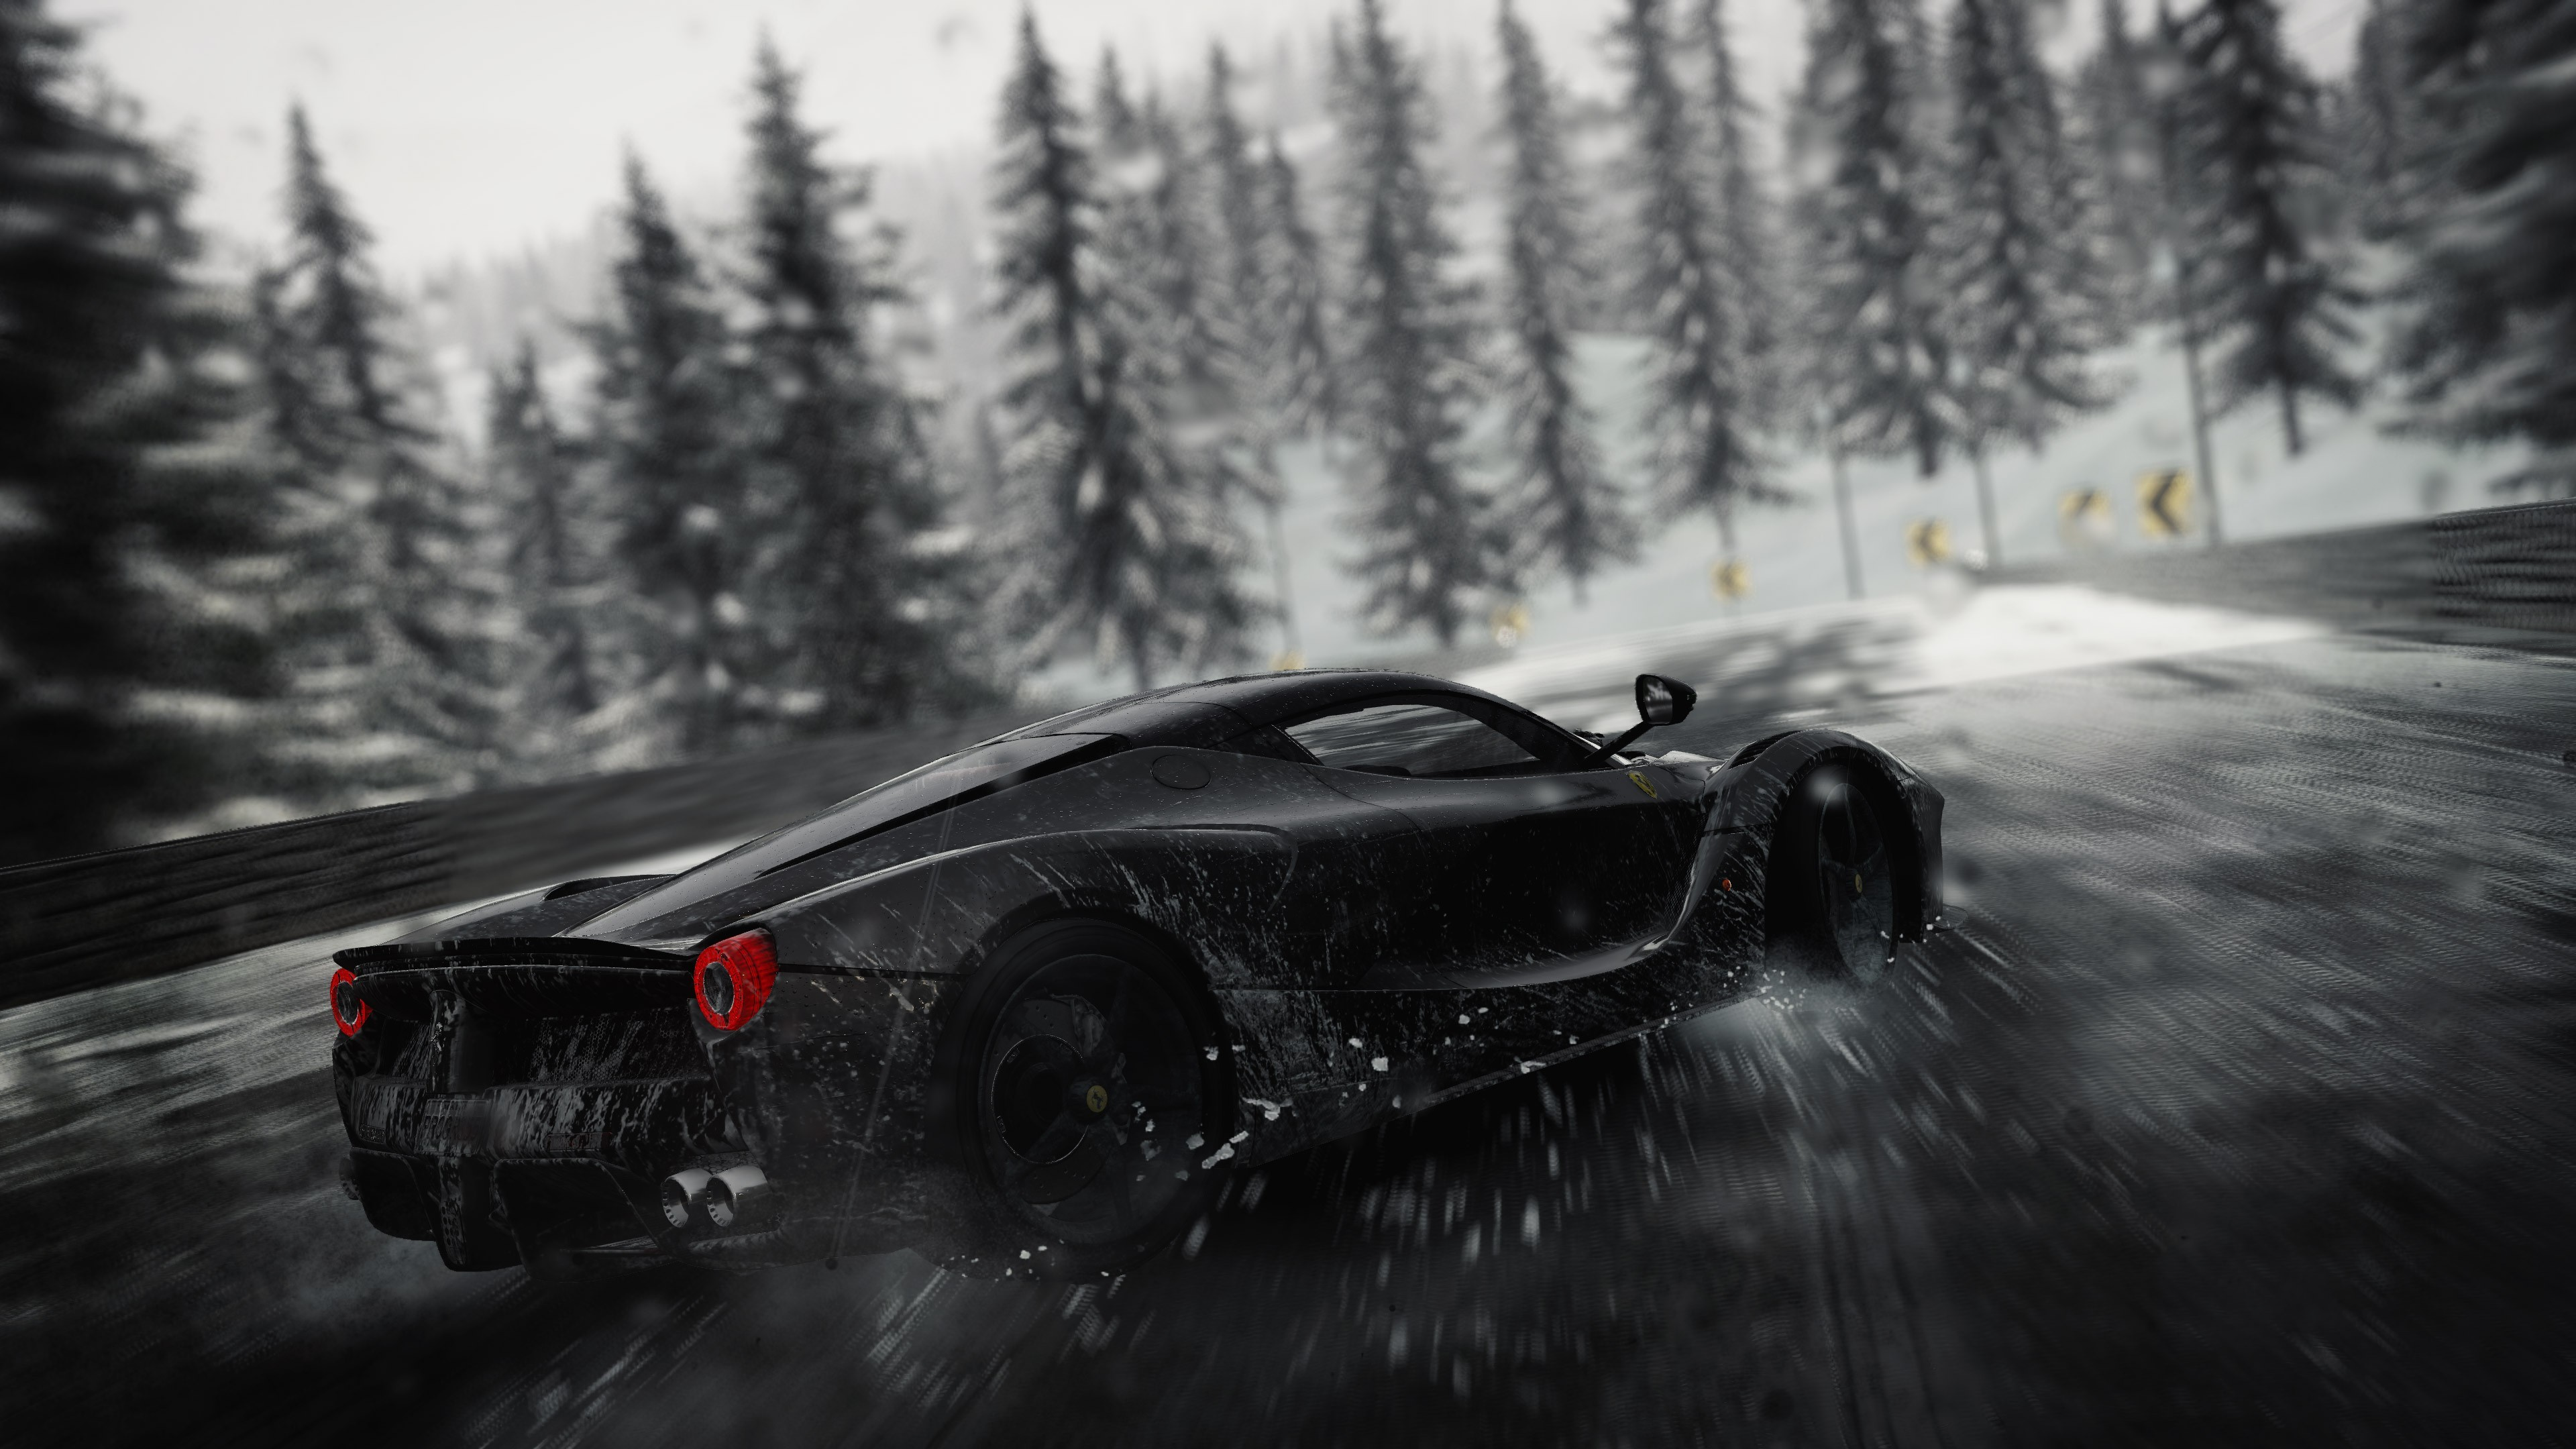 Tags: The Crew, Ferrari, Rain, 4K